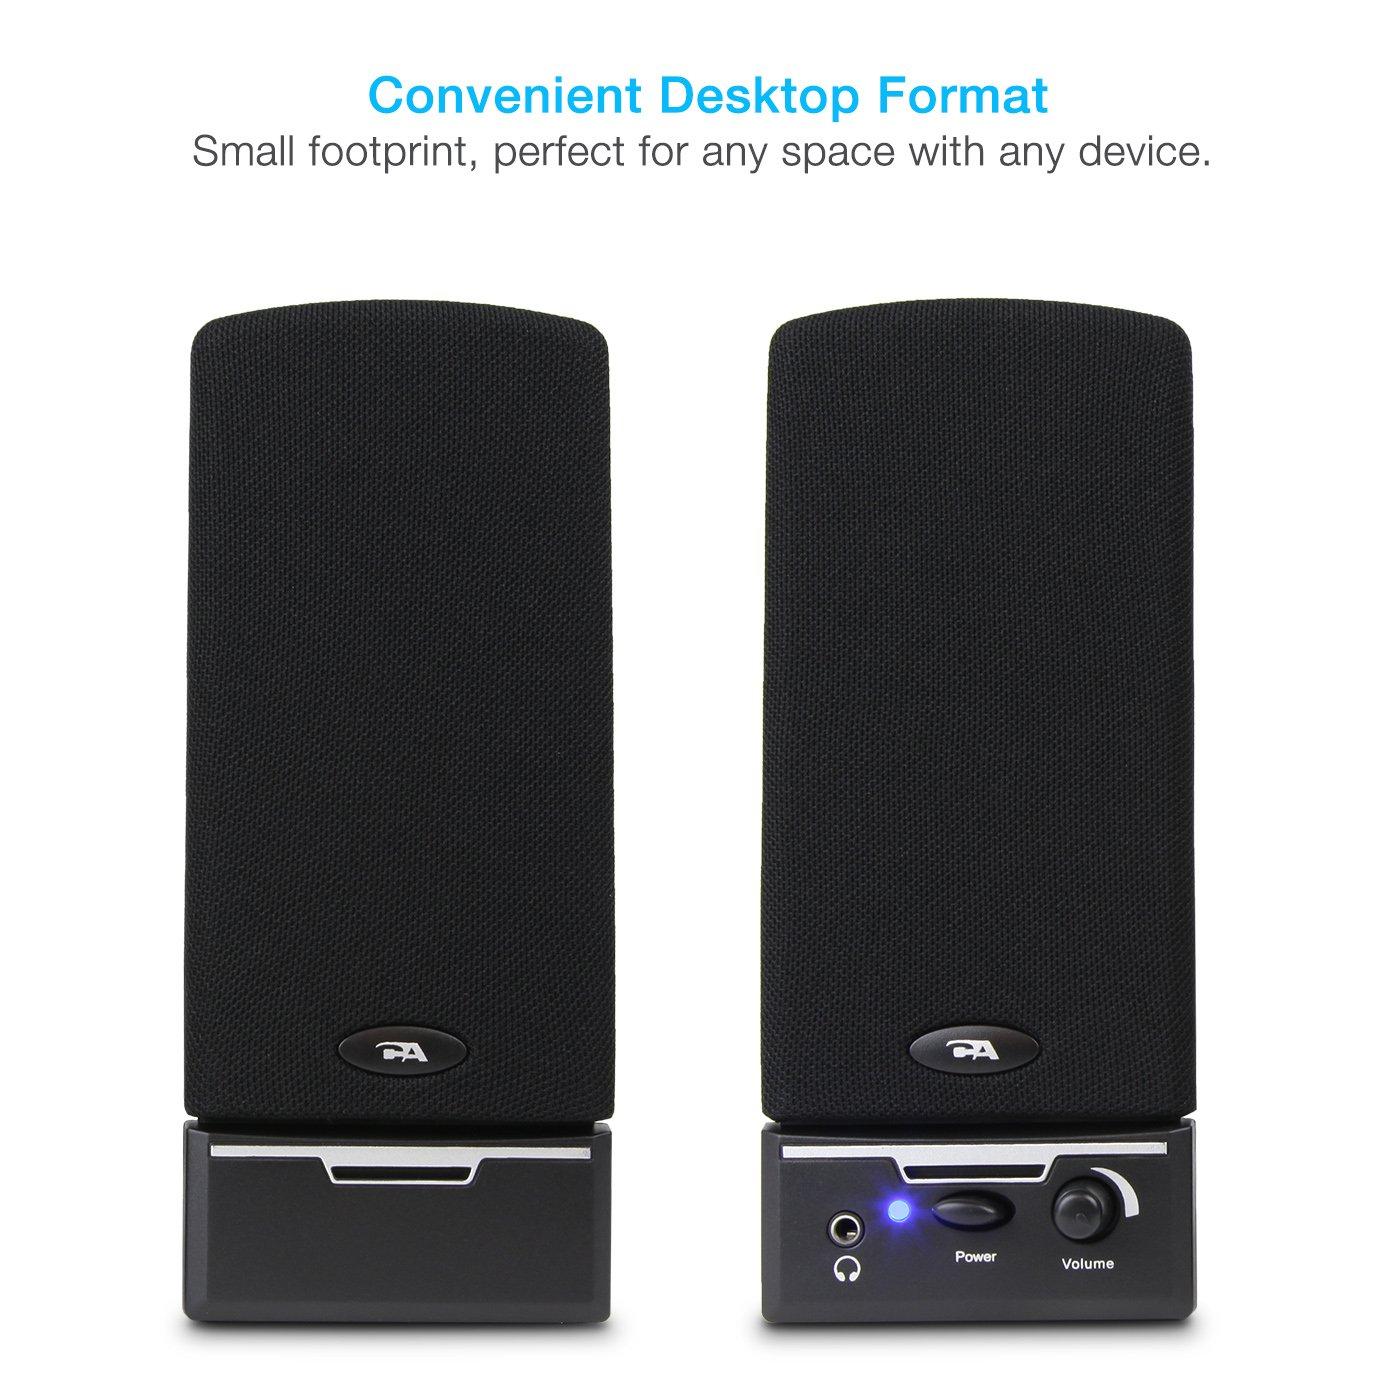 Cyber Acoustics CA-2014 multimedia desktop computer speakers by Cyber Acoustics (Image #2)